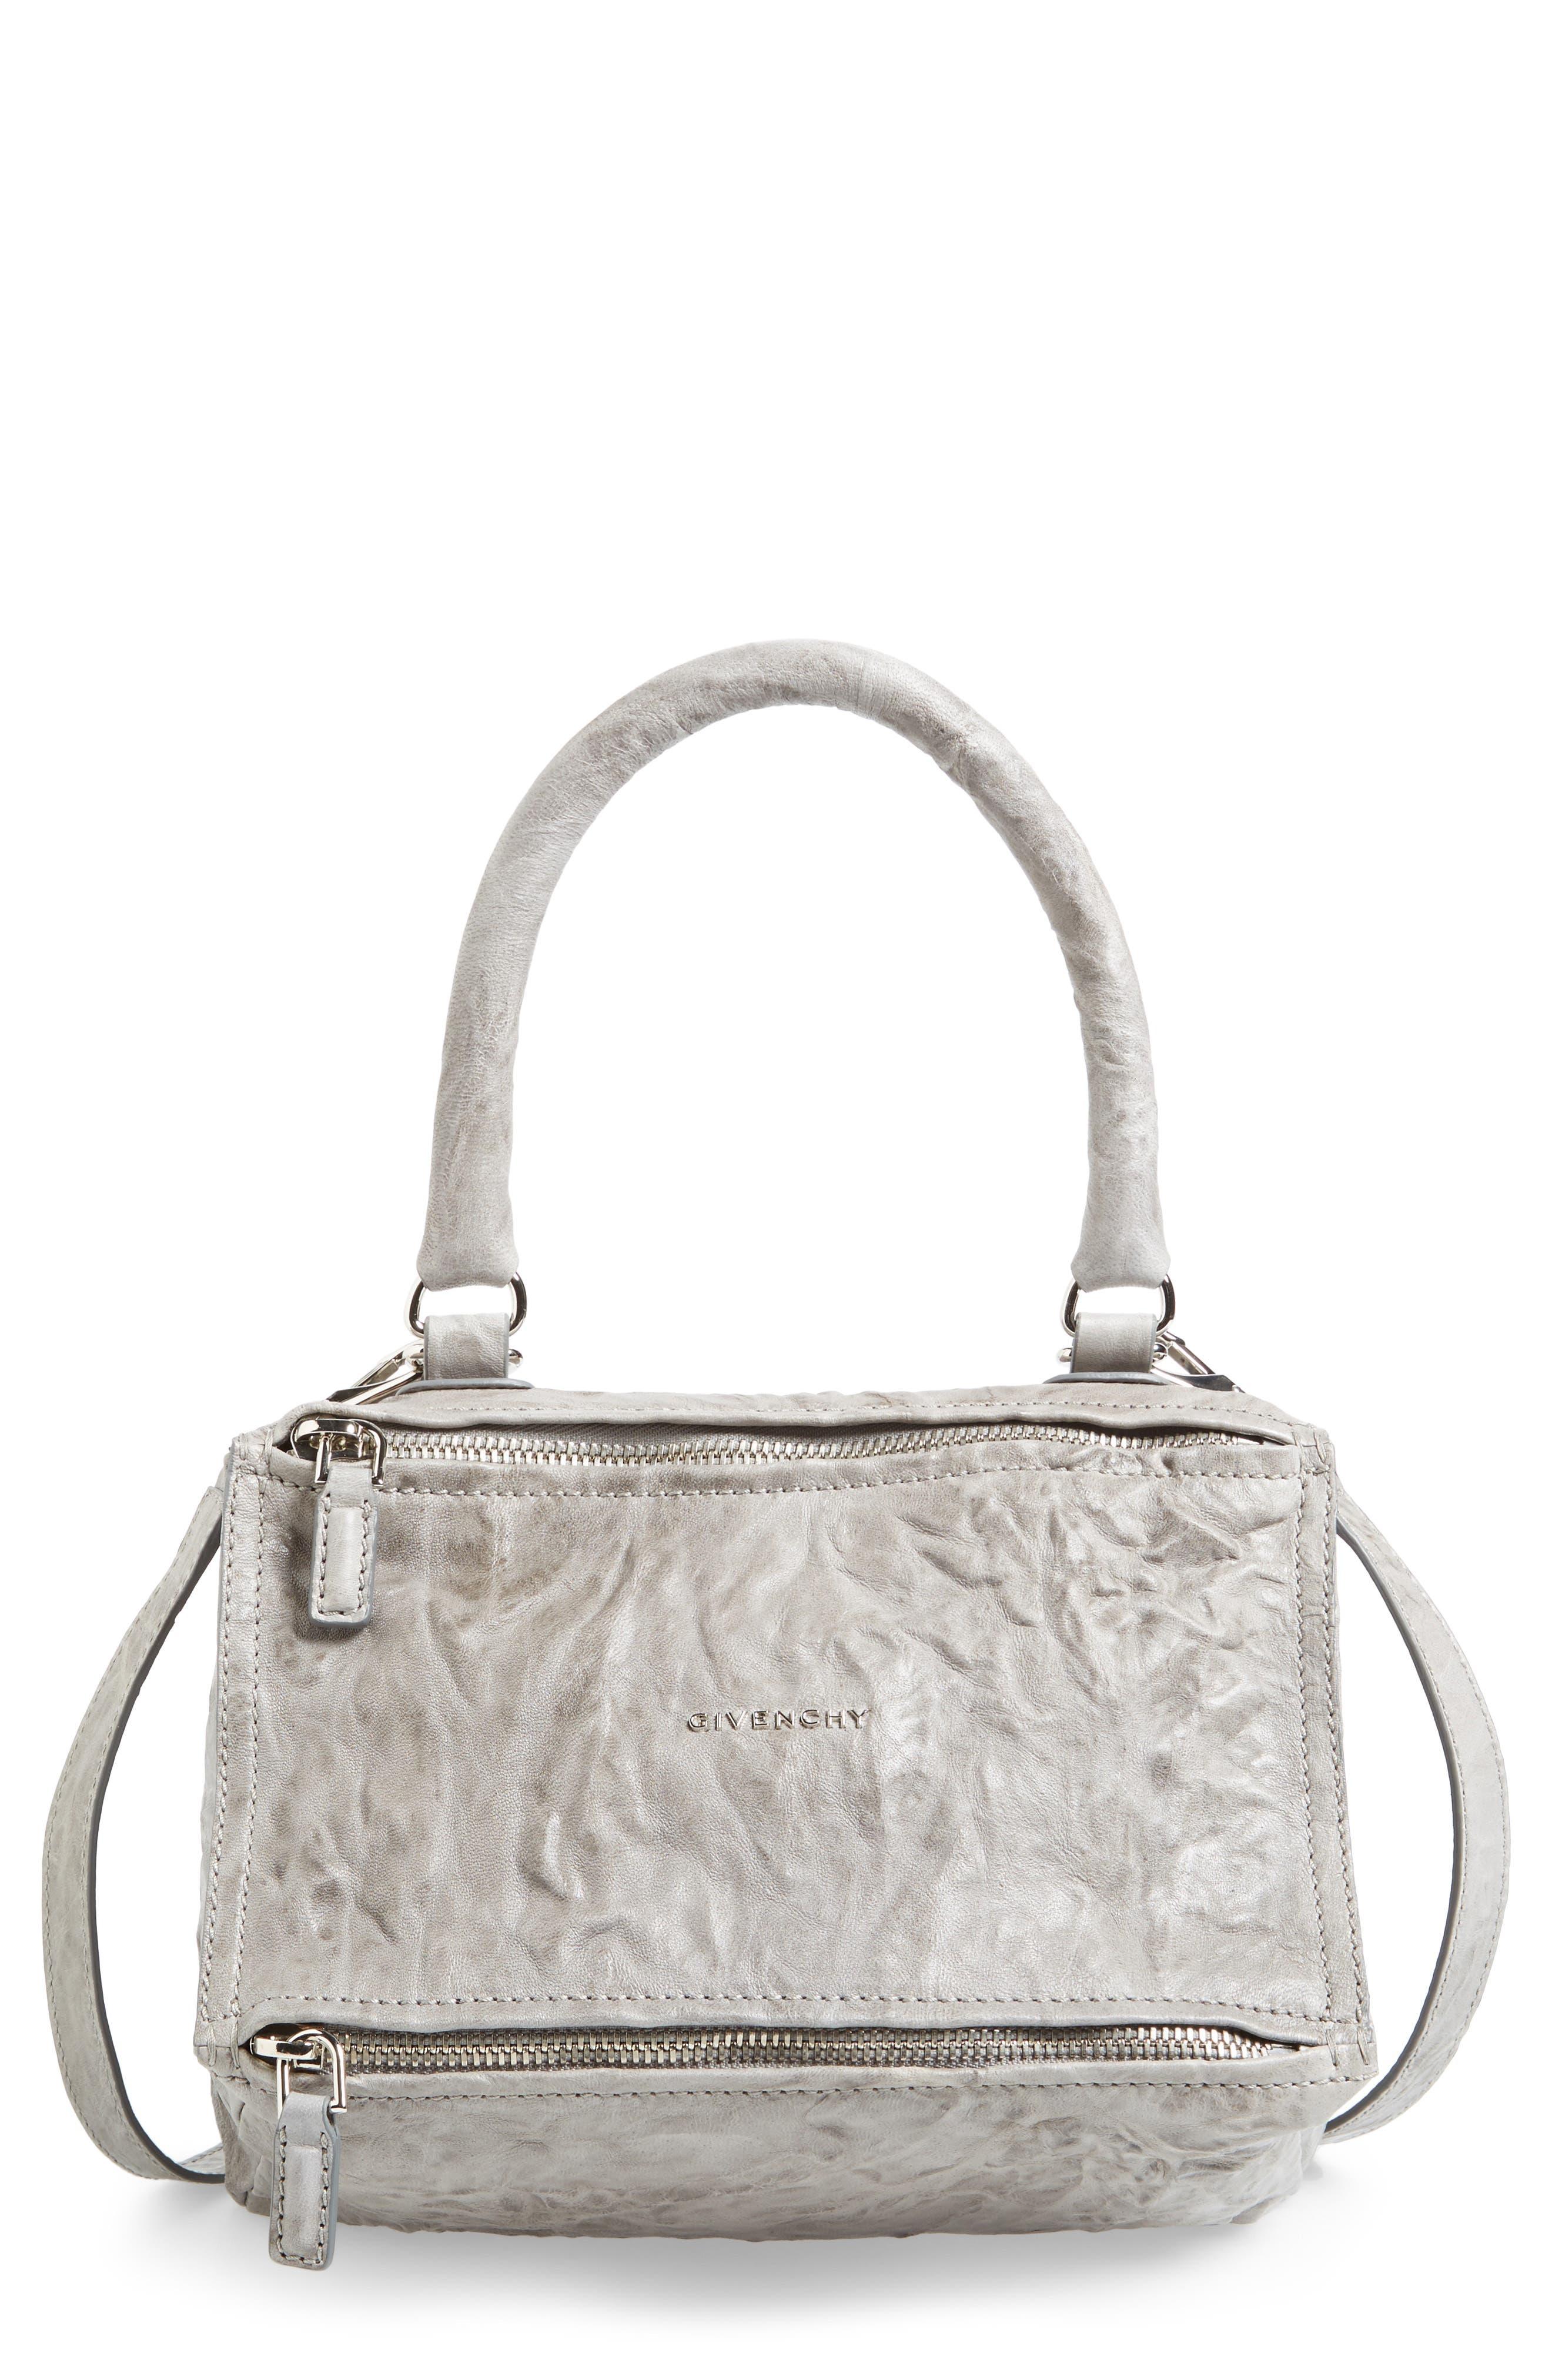 Main Image - Givenchy 'Small Pepe Pandora' Leather Shoulder Bag